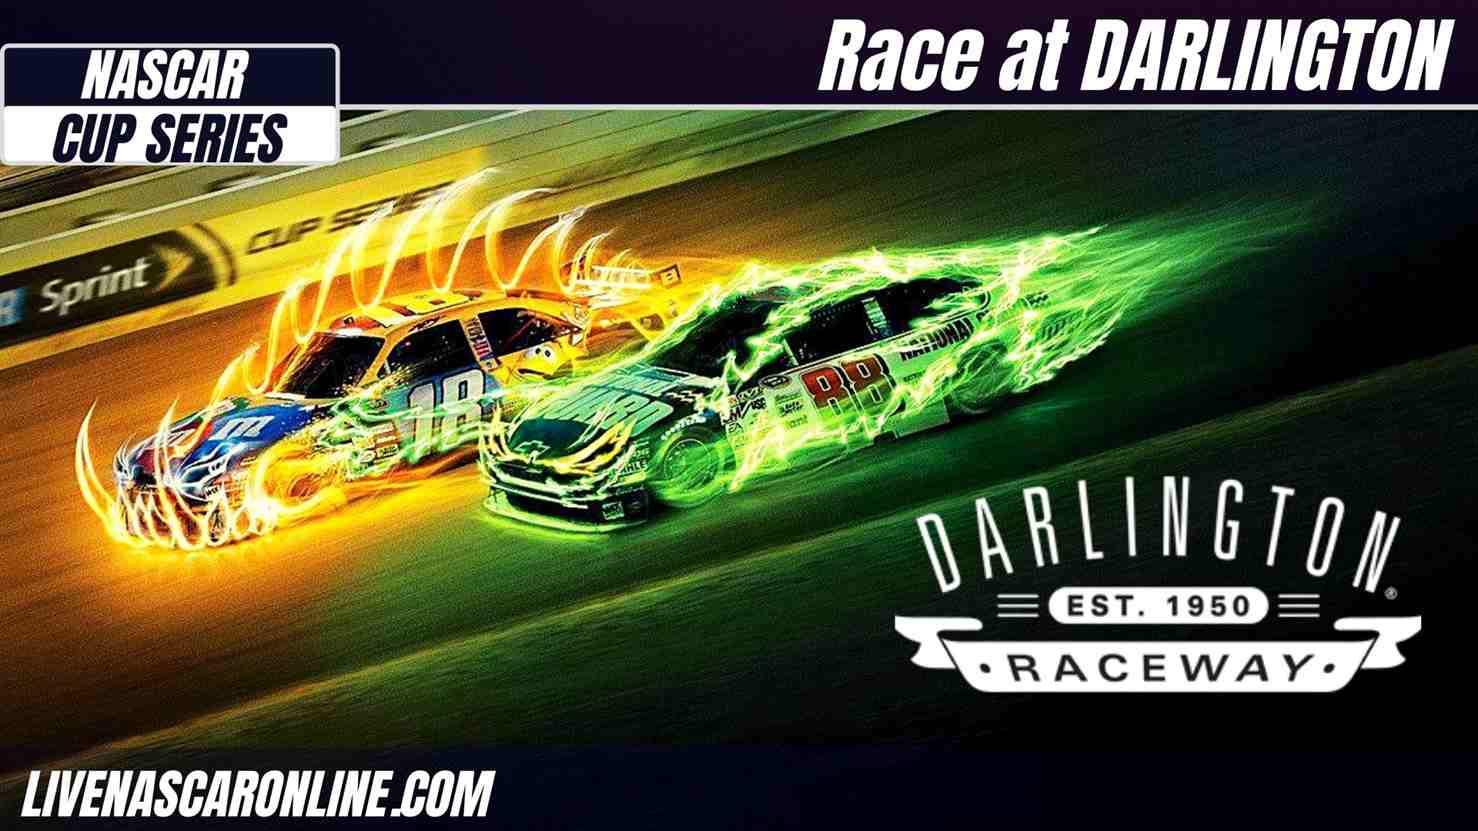 NASCAR Cup Race at Darlington Live Stream 2021